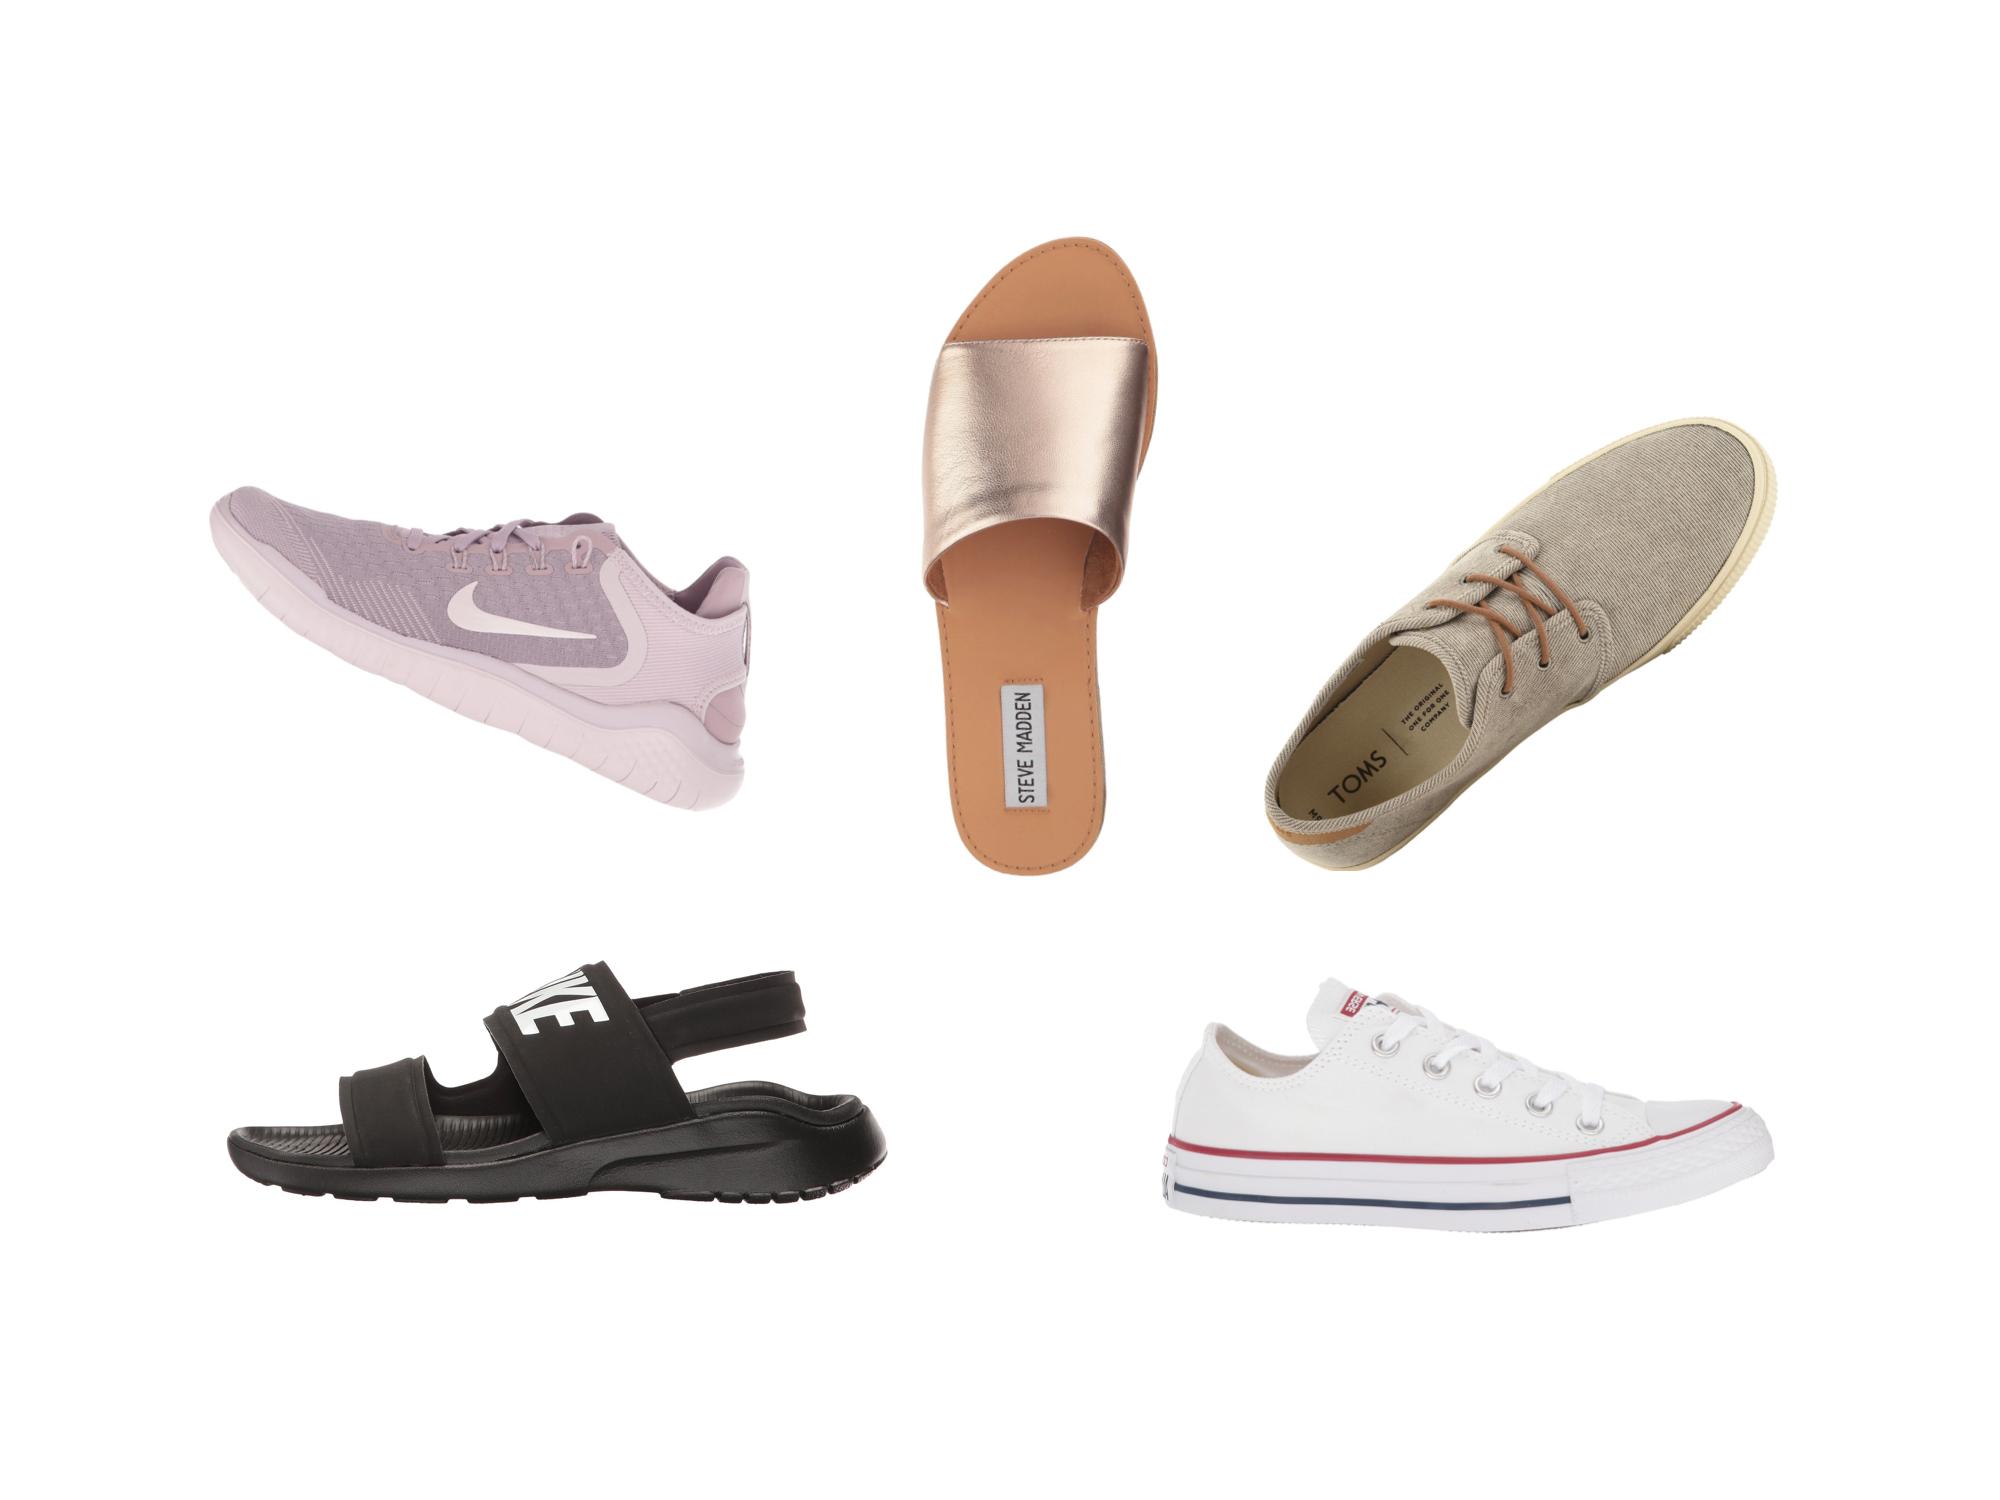 Shoe Trends Summer 2018: Best-Selling